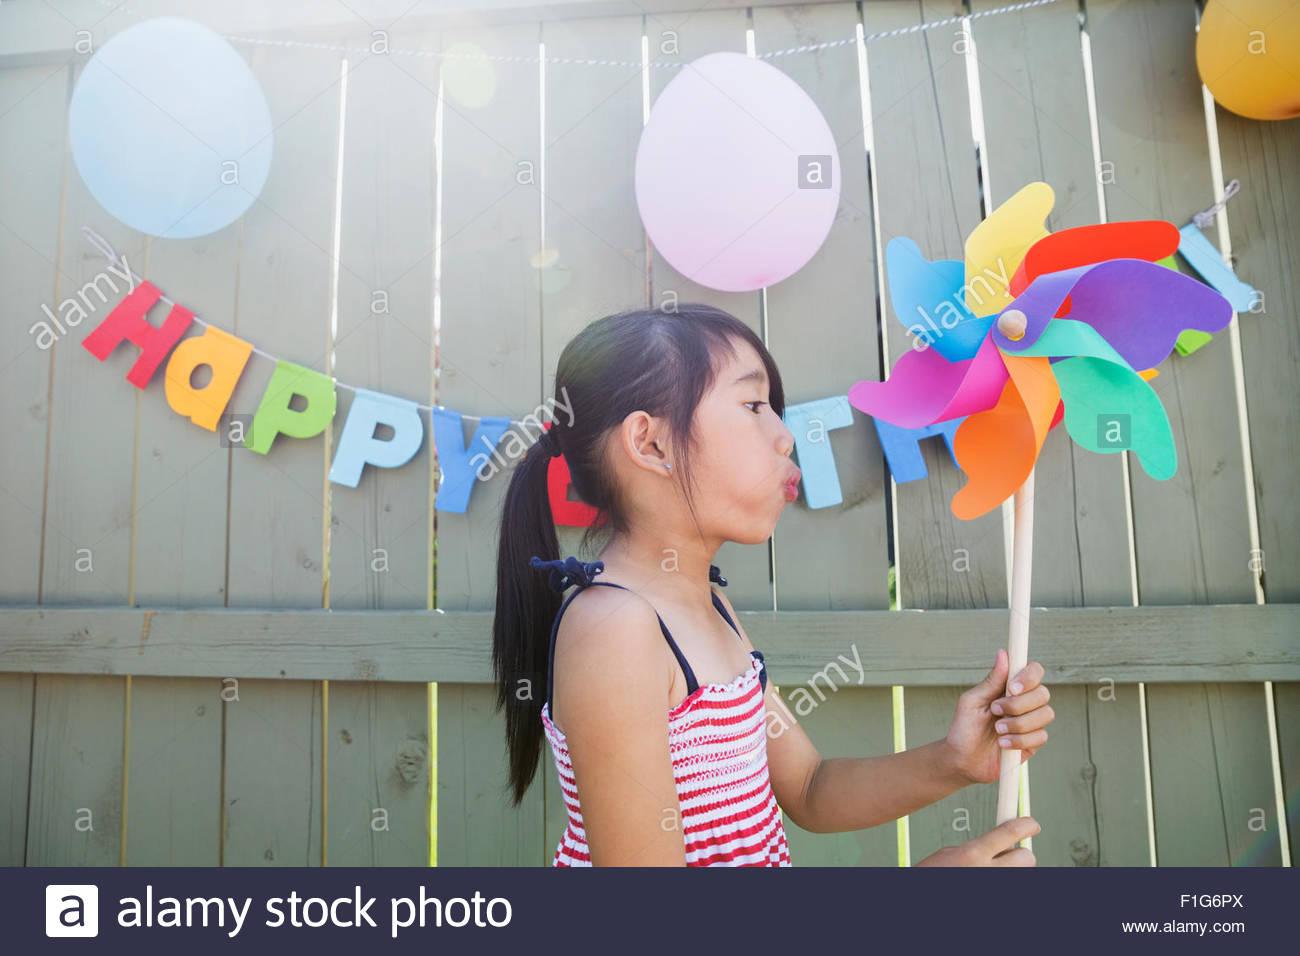 Girl blowing pinwheel at backyard birthday party - Stock Image